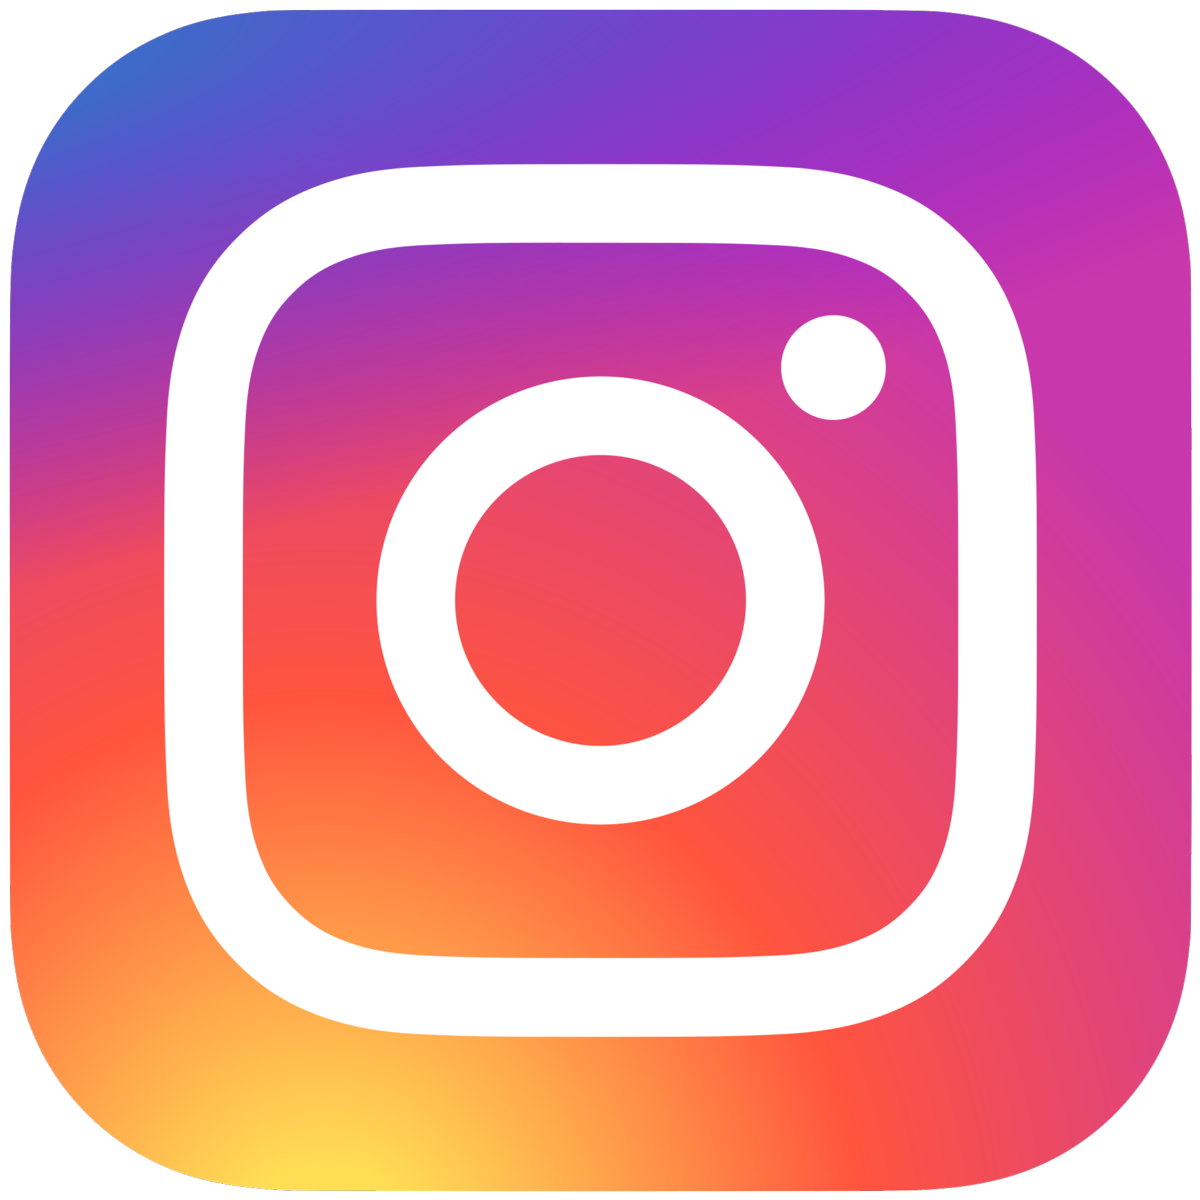 Schlatter-Motorräder AG bei Instagram